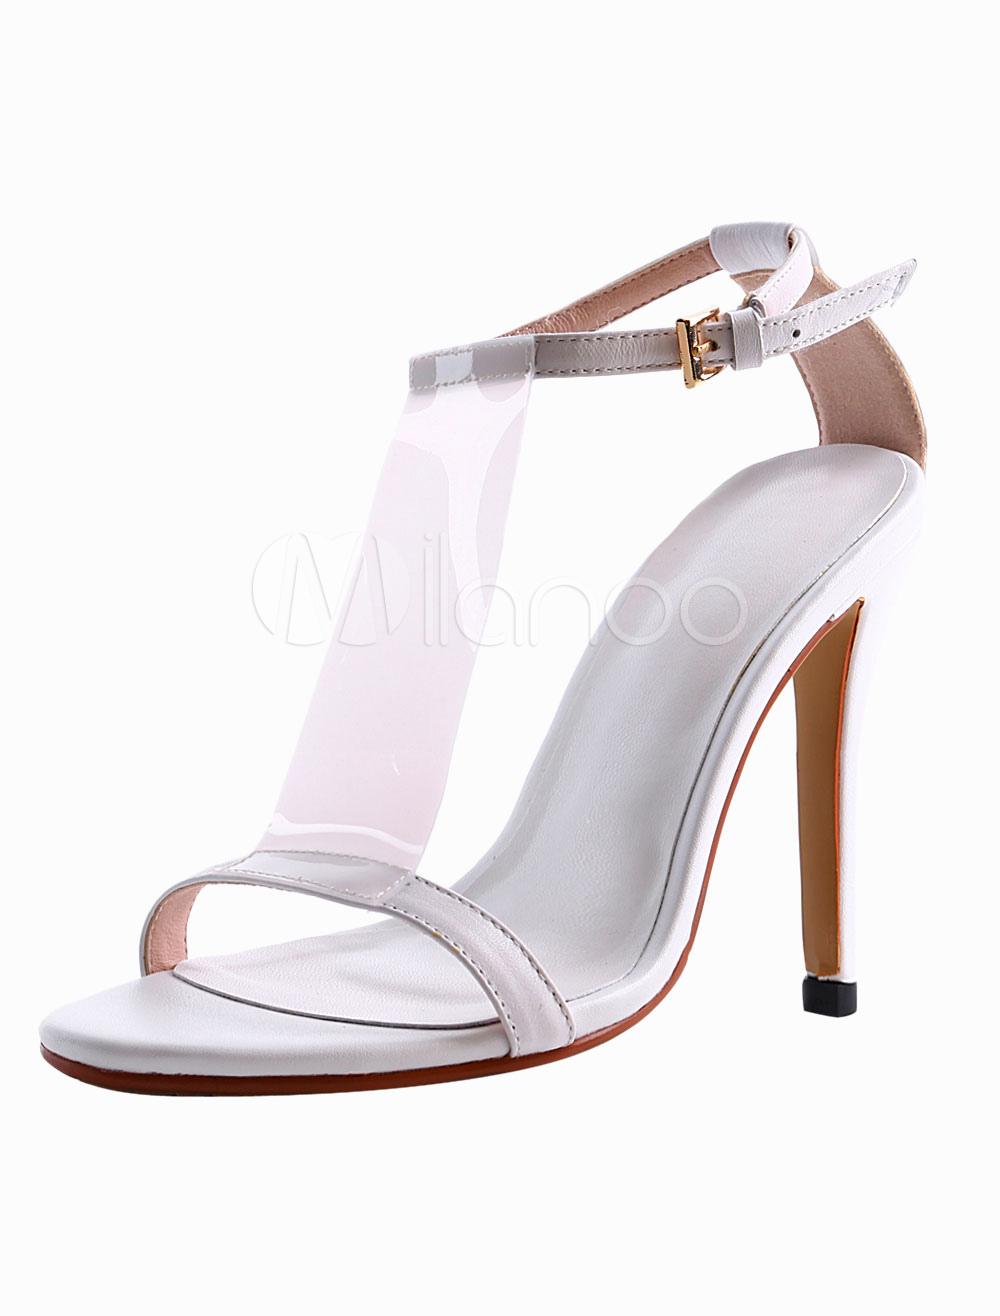 White Cowhide Stiletto Heel T-strap Sandals For Ladies